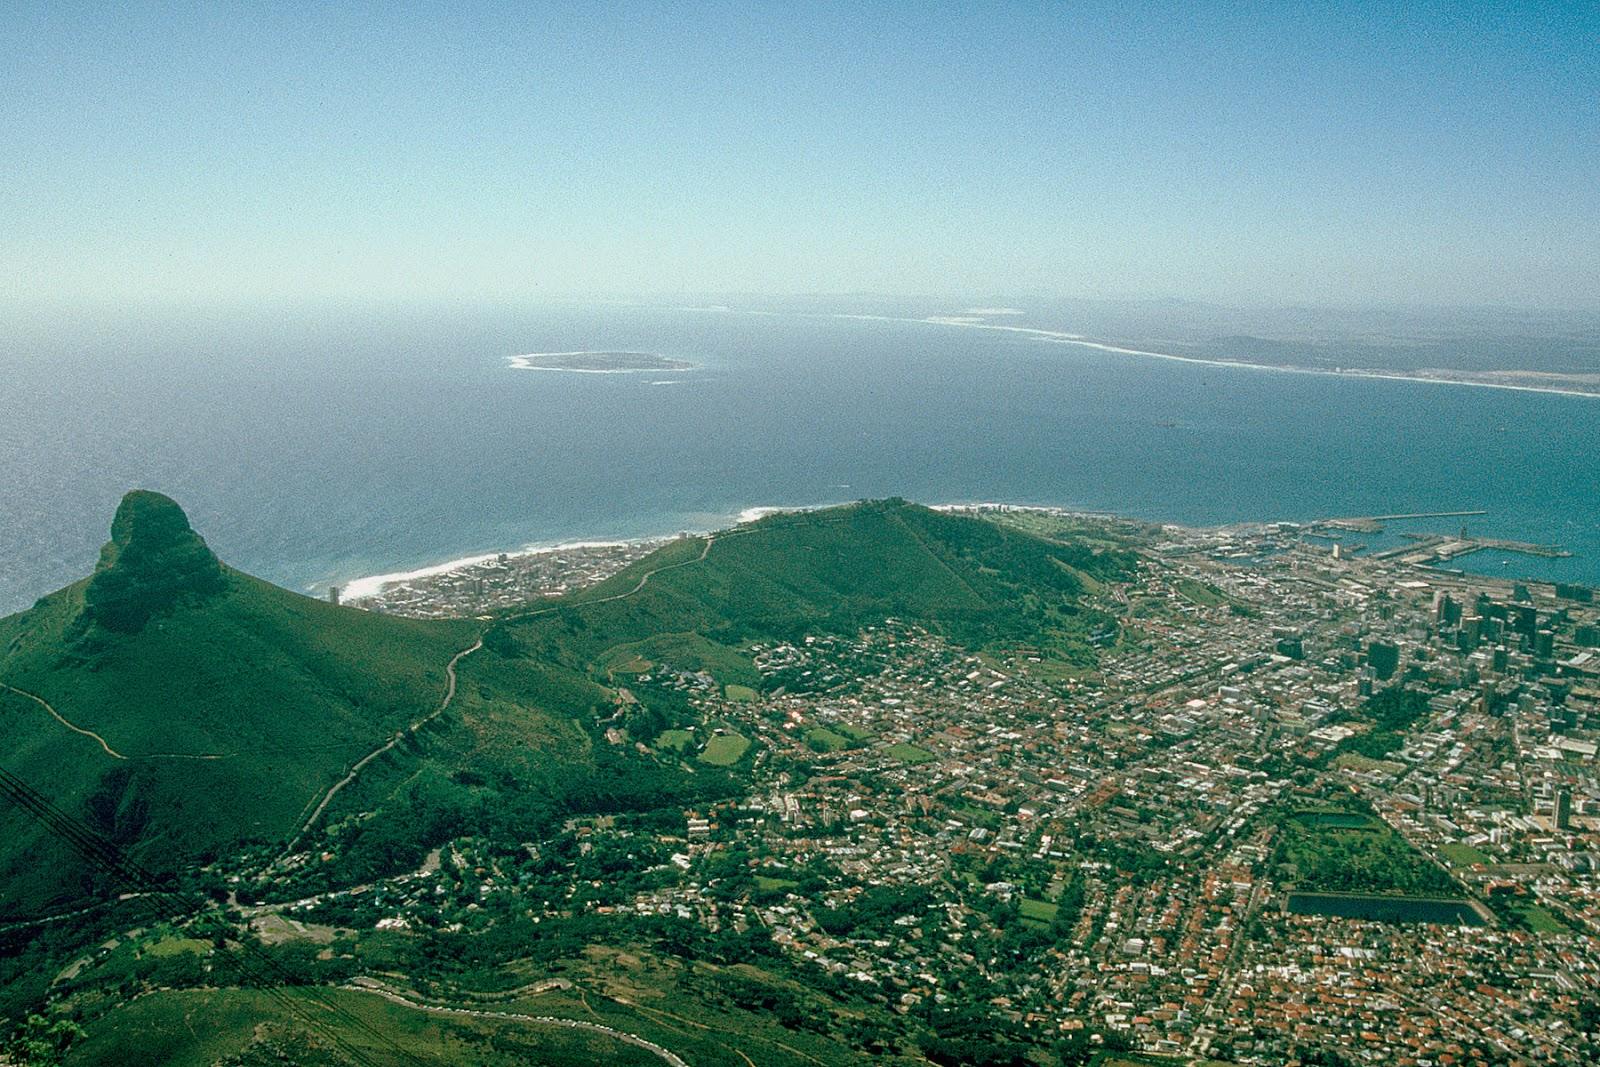 Official blog cape town robben island - Robben island and table mountain tour ...